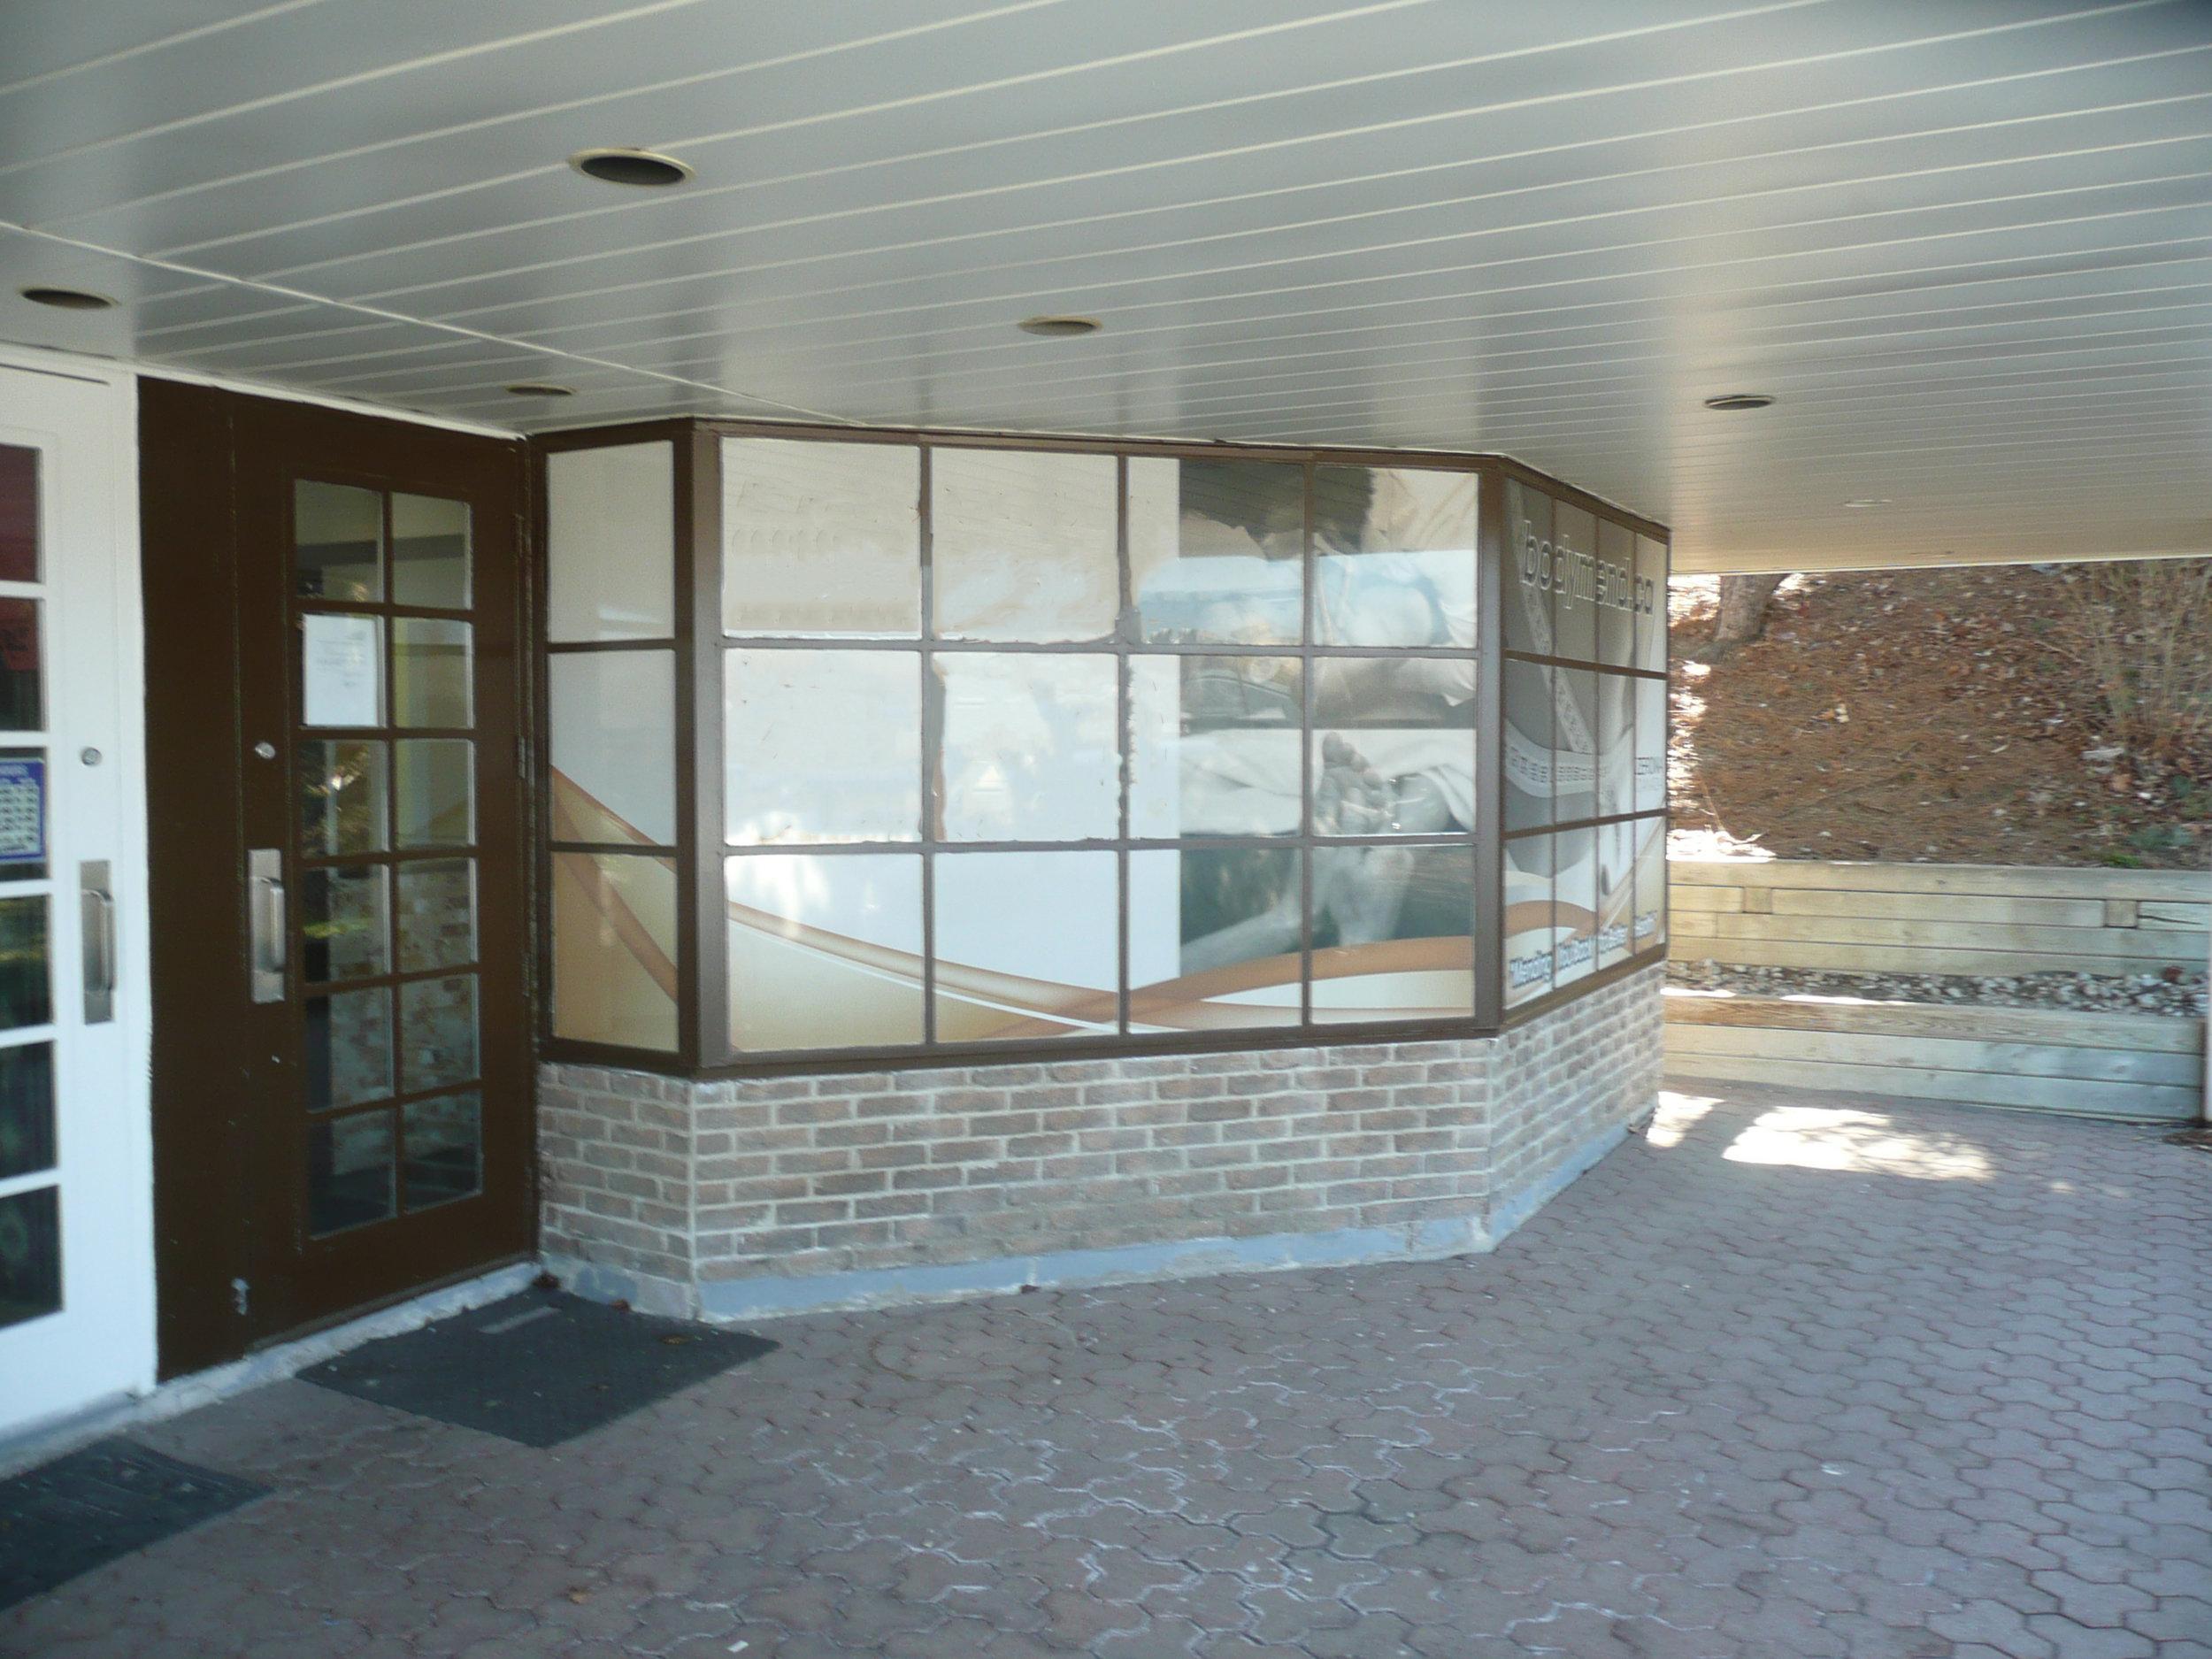 188 Main Street South exterior photo-unit10.jpg